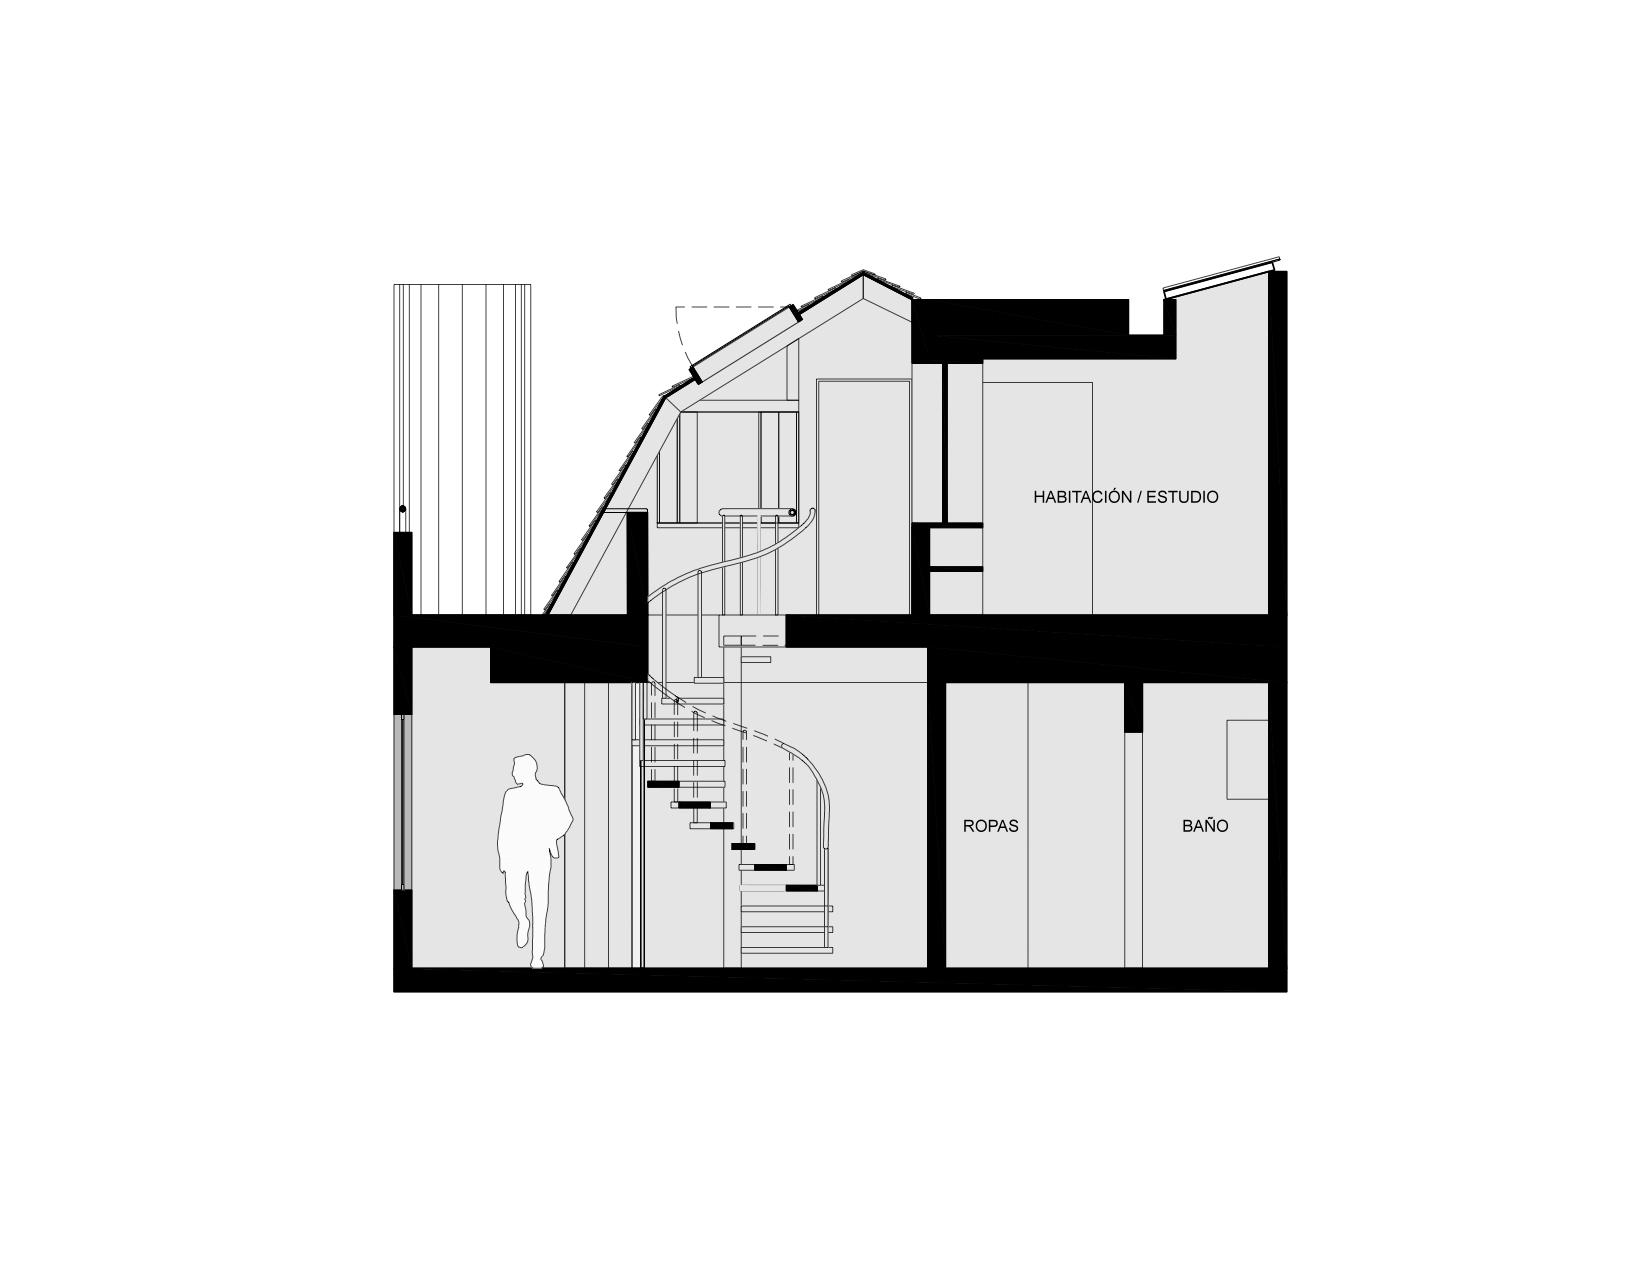 CLL57_WEB_CORTE_propuesta